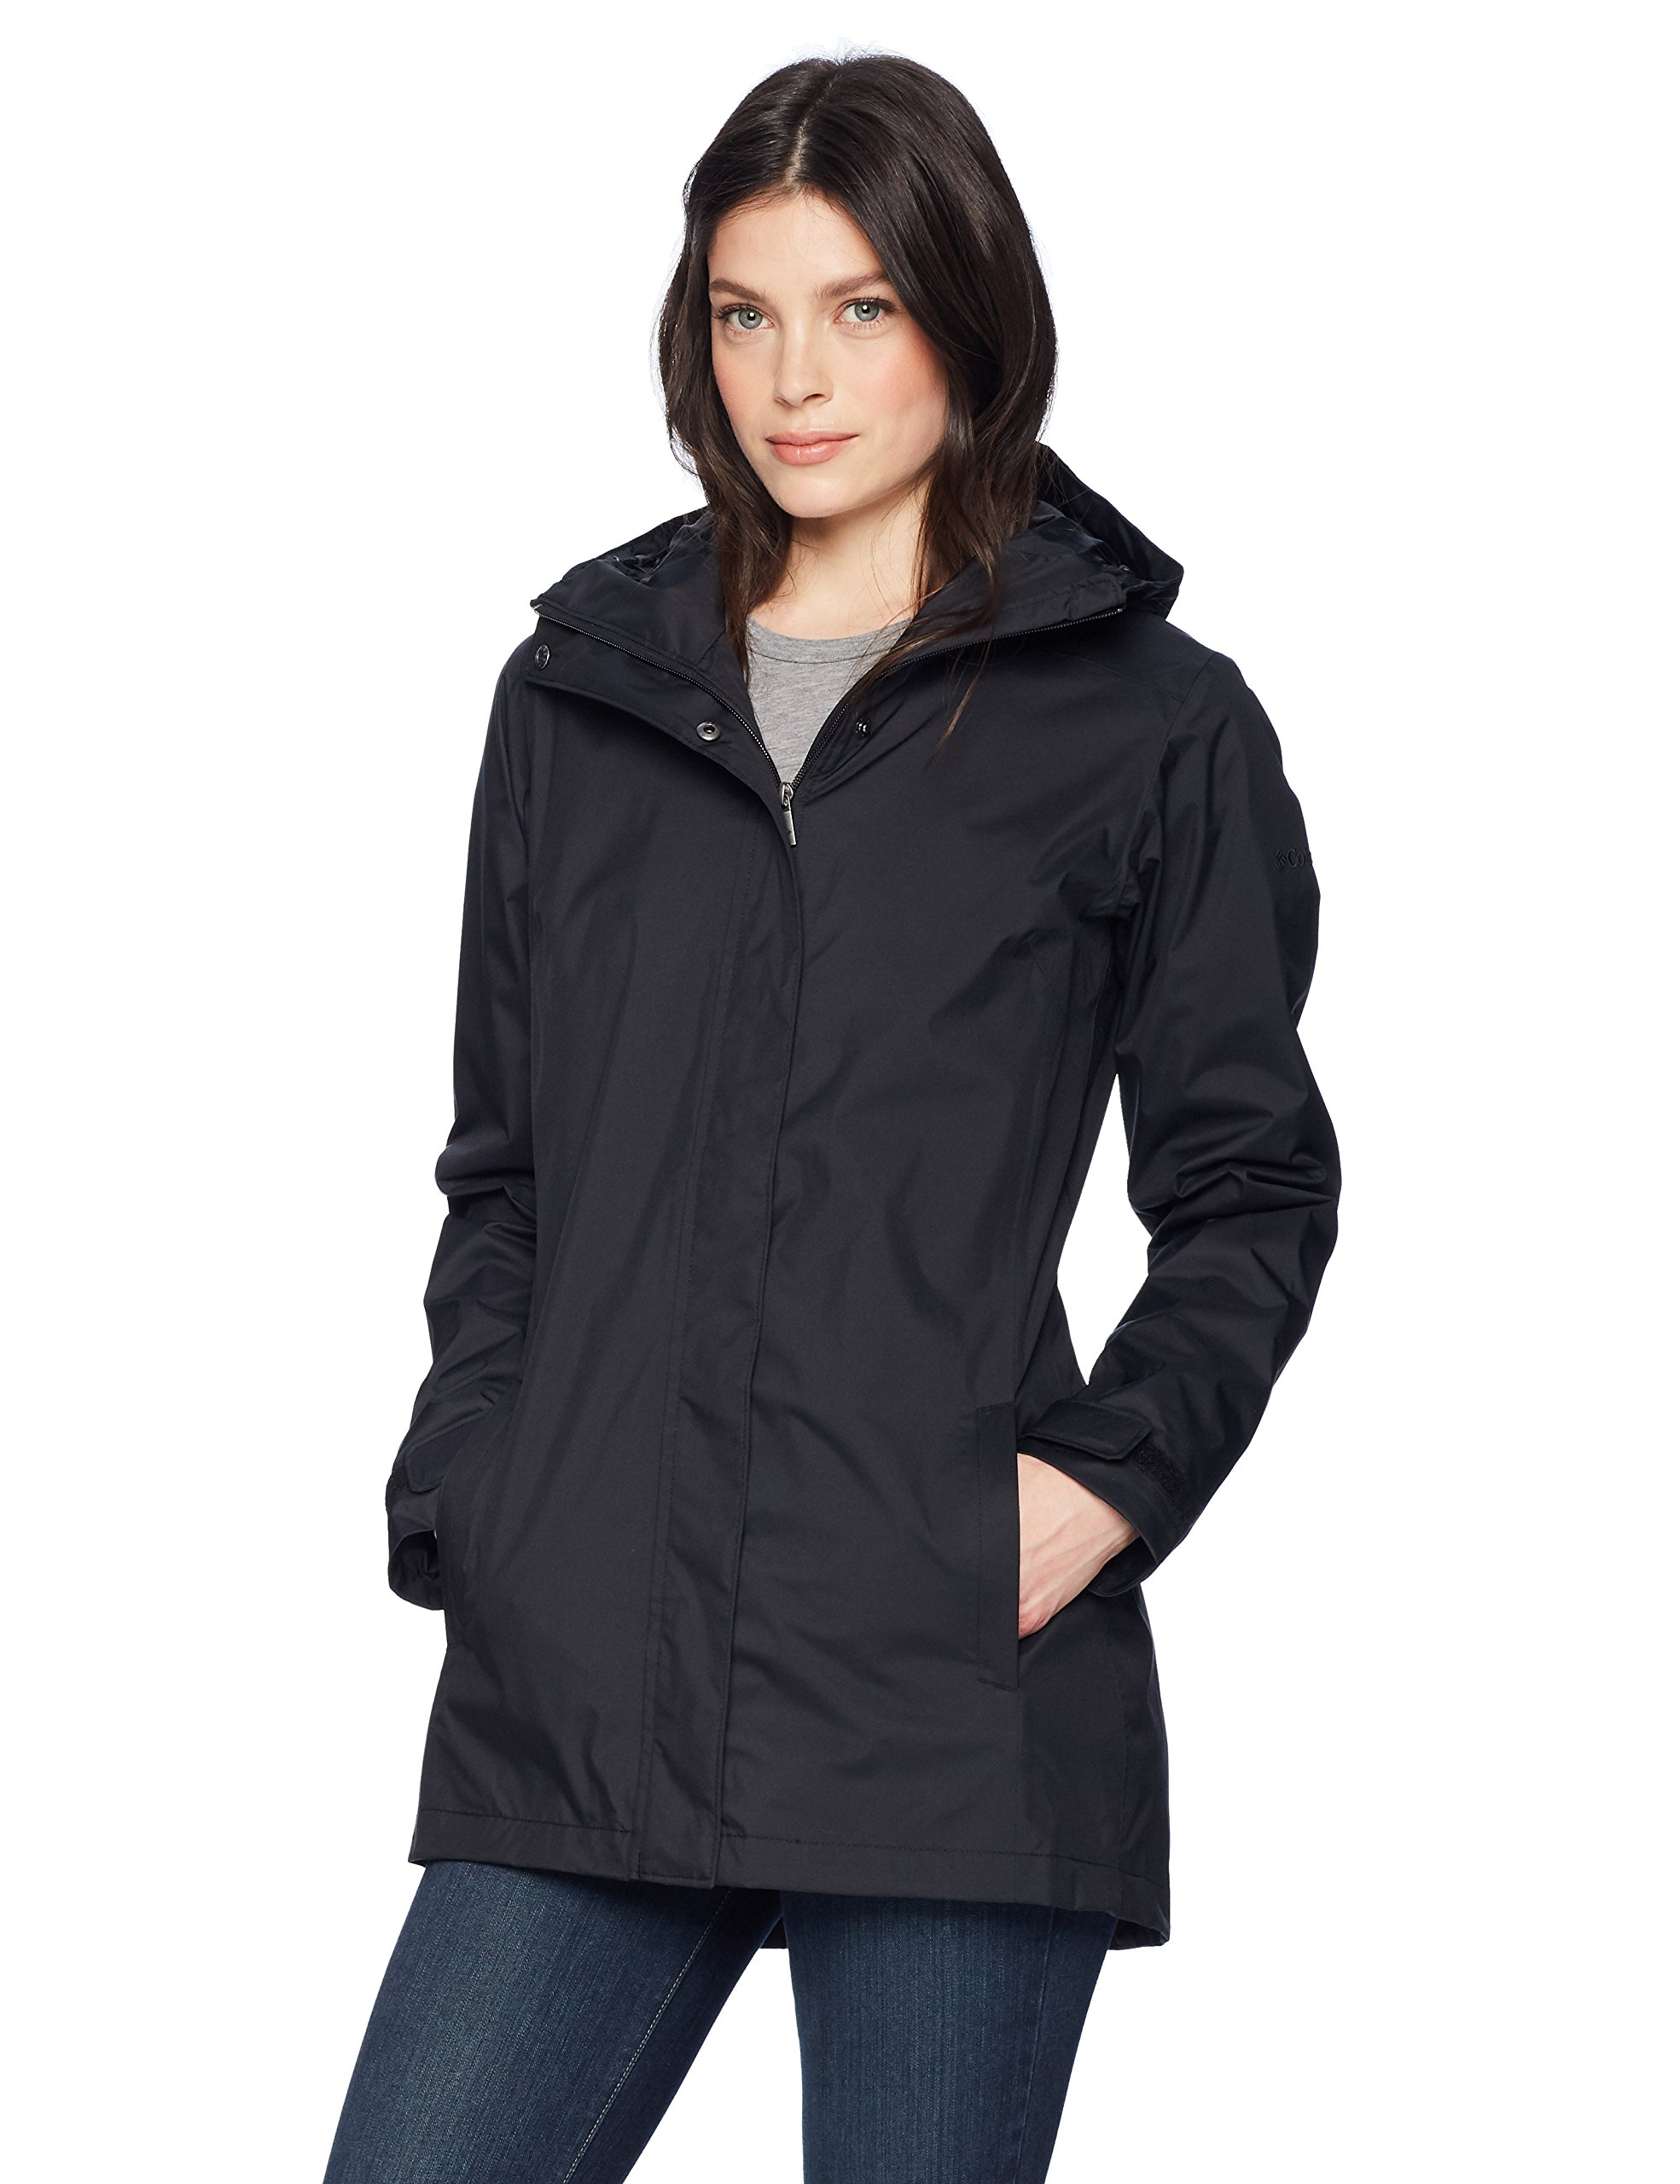 Columbia Women's Splash A Little Ii Jacket, Black, Large